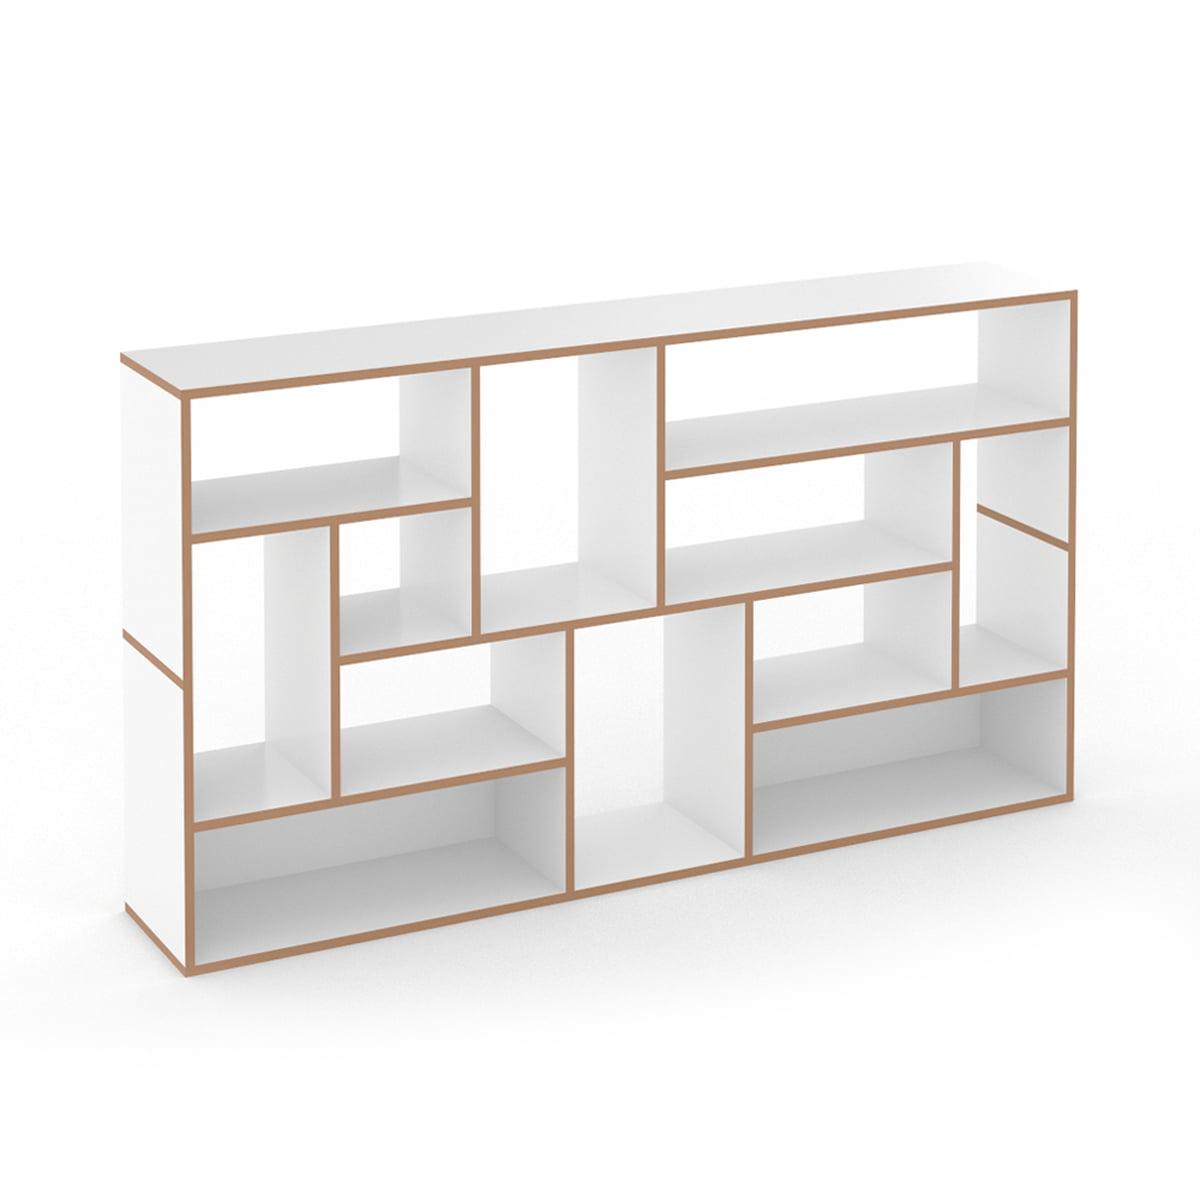 hanibal sideboard von tojo im shop kaufen. Black Bedroom Furniture Sets. Home Design Ideas